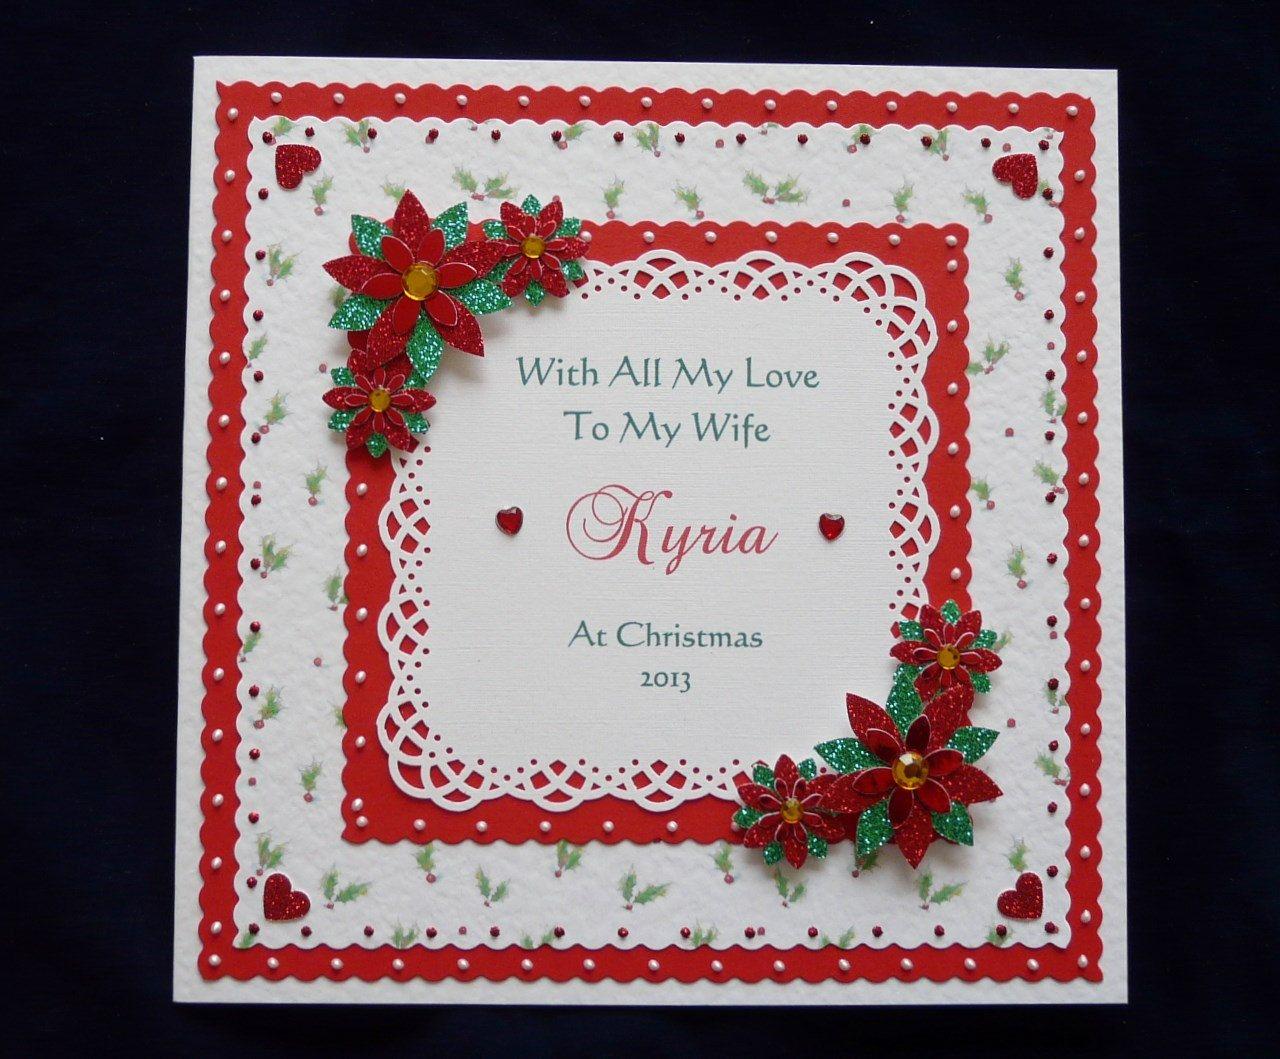 Christmas Card Wife/Husband/Girlfriend/Mum etc 8x8 inch Handmade 2018 Personalised